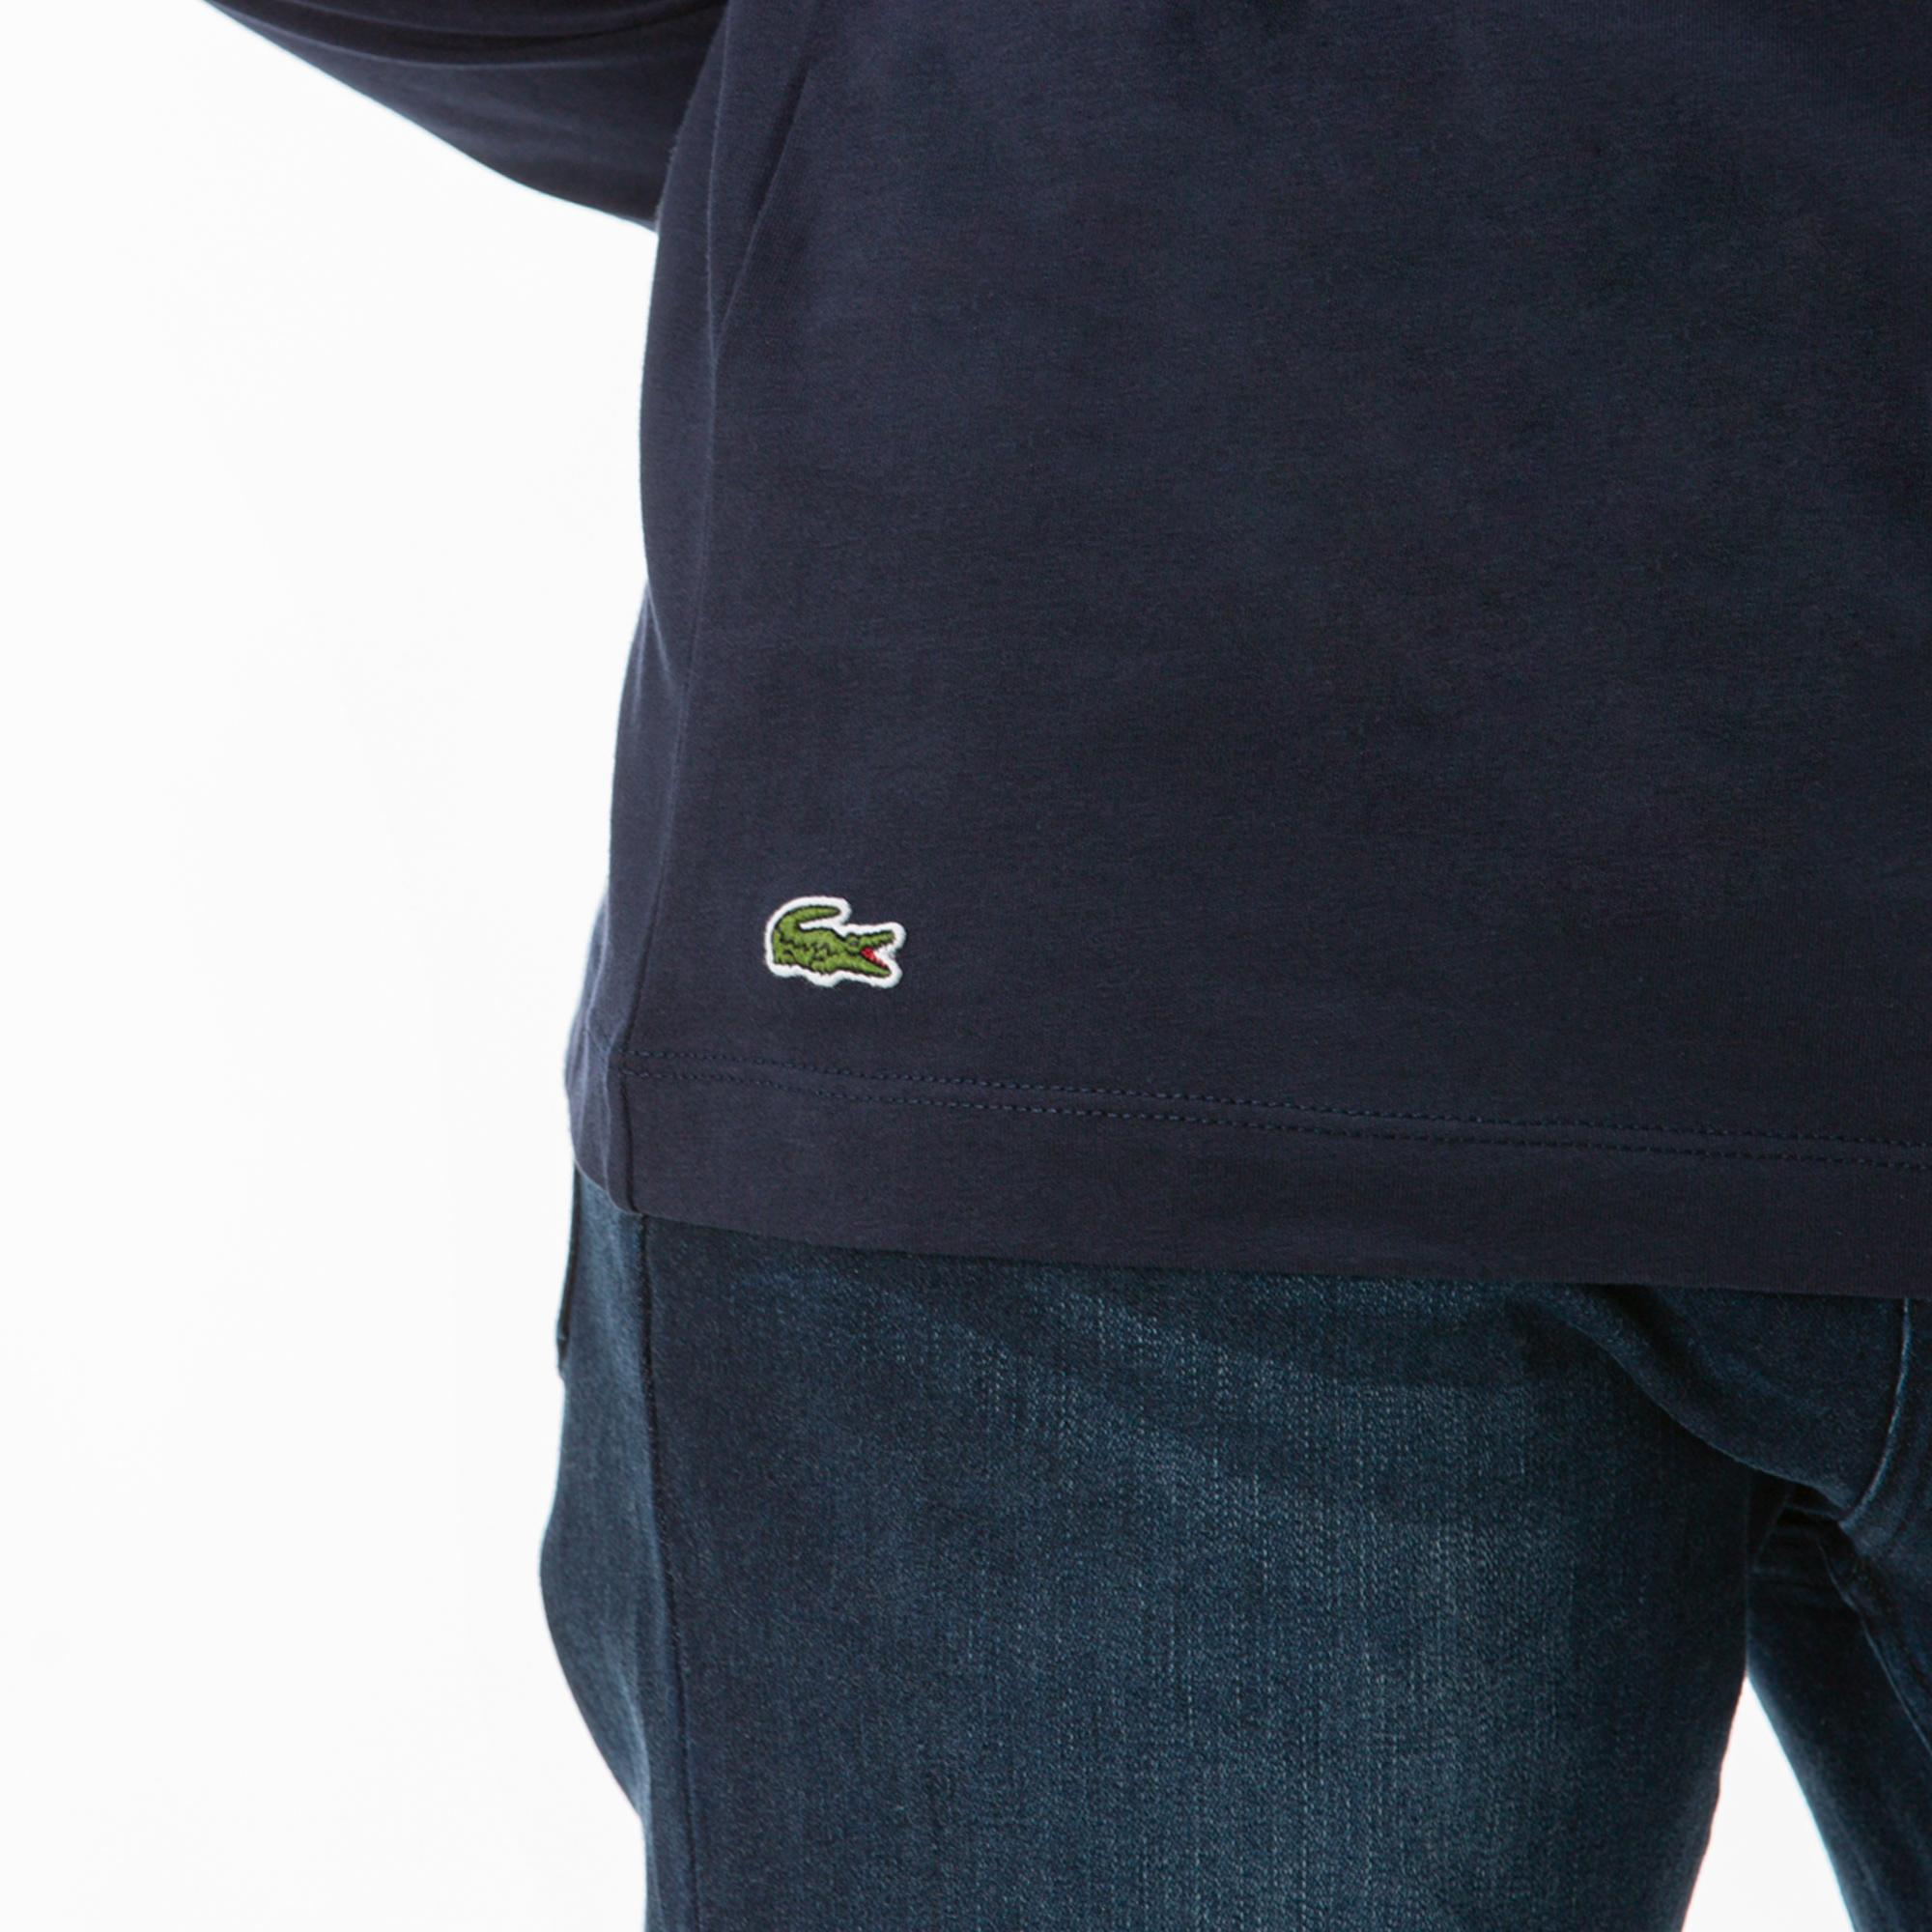 Lacoste Erkek Lacivert Uzun Kollu Desenli T-Shirt